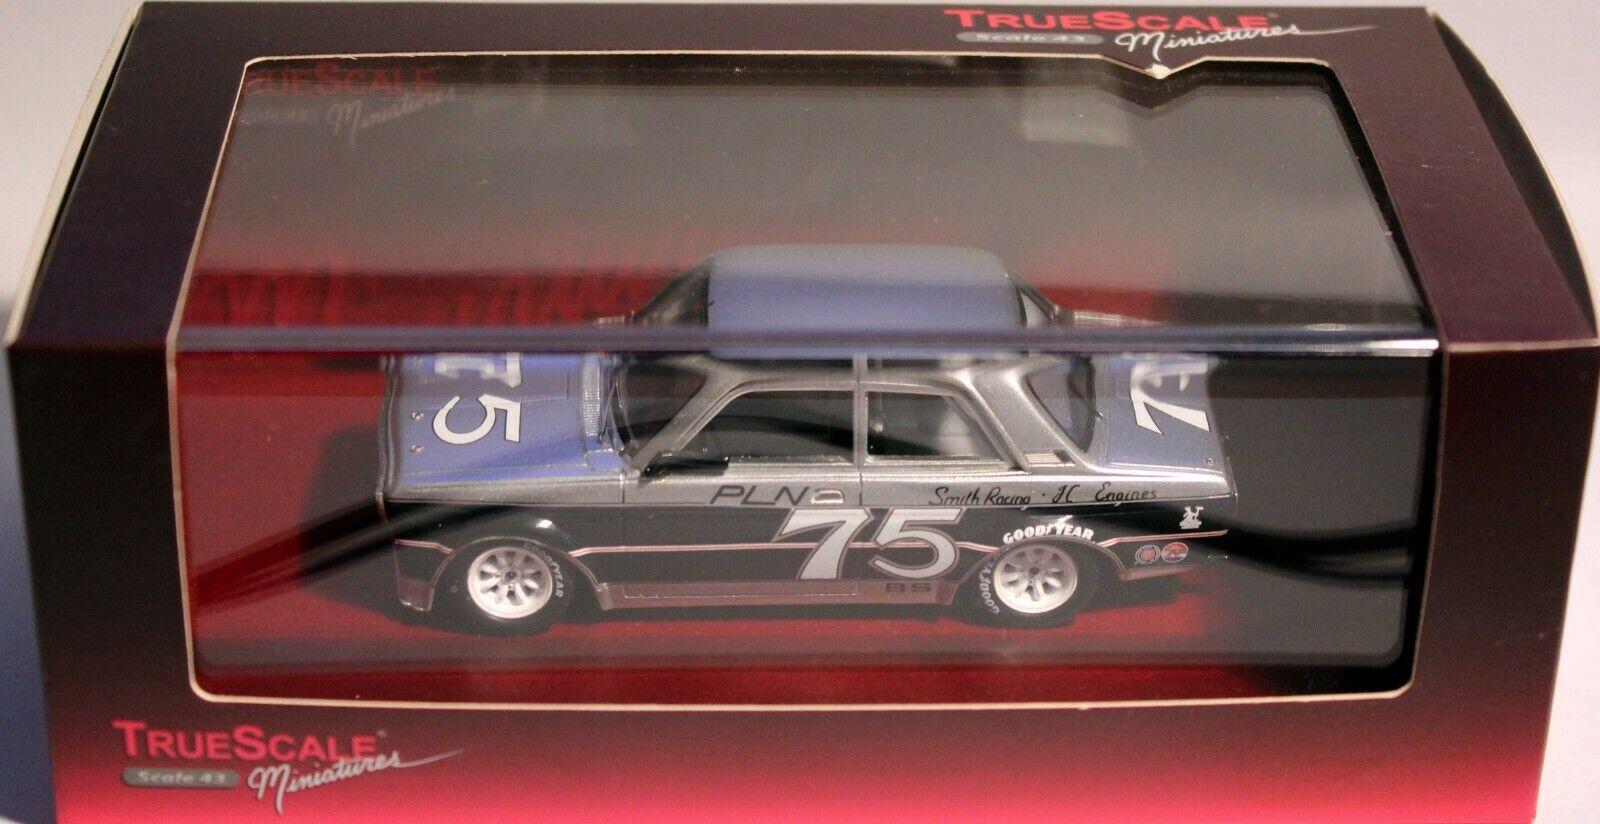 TrueScale Miniatures 1 43 1976 Datsun 510 75 Paul Newman PLN RACING TSM104318